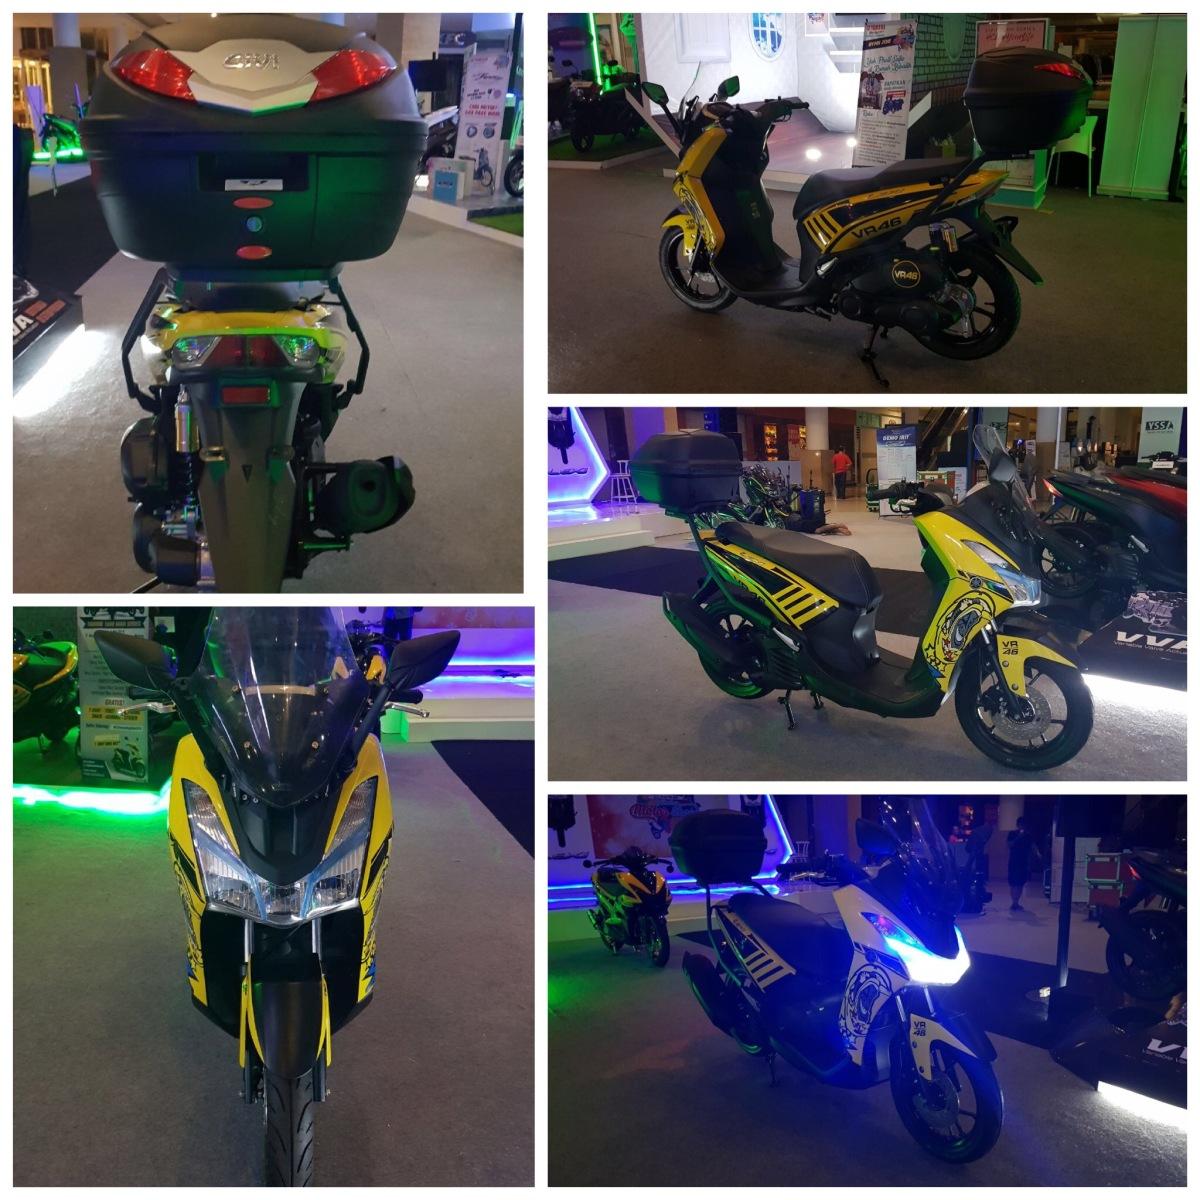 Modif Yamaha Lexi ini, bikin jatuh cinta ingin memiliki!